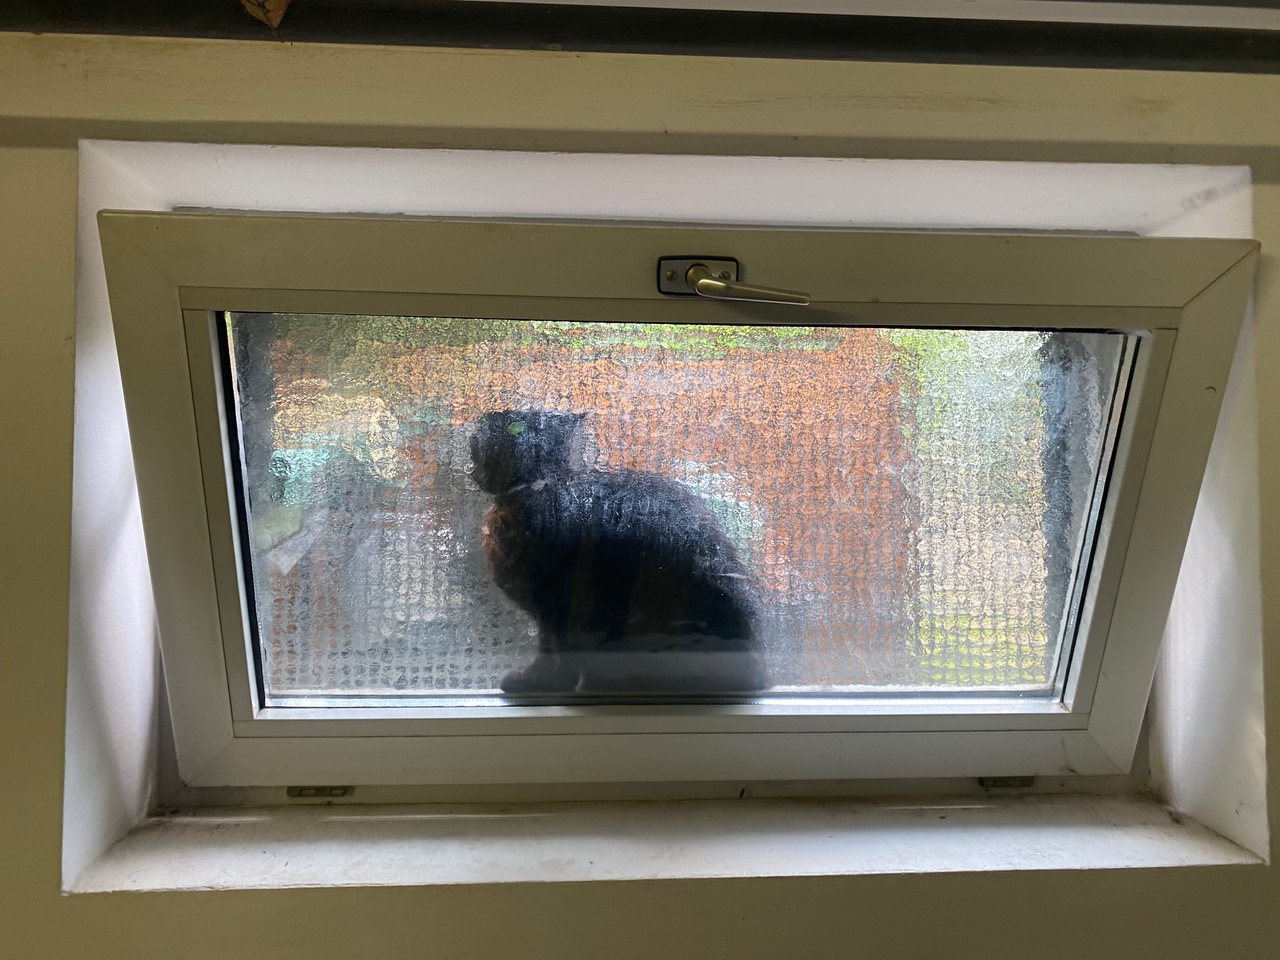 Hund trieb Katze in die Enge - Endstation Kellerfenster